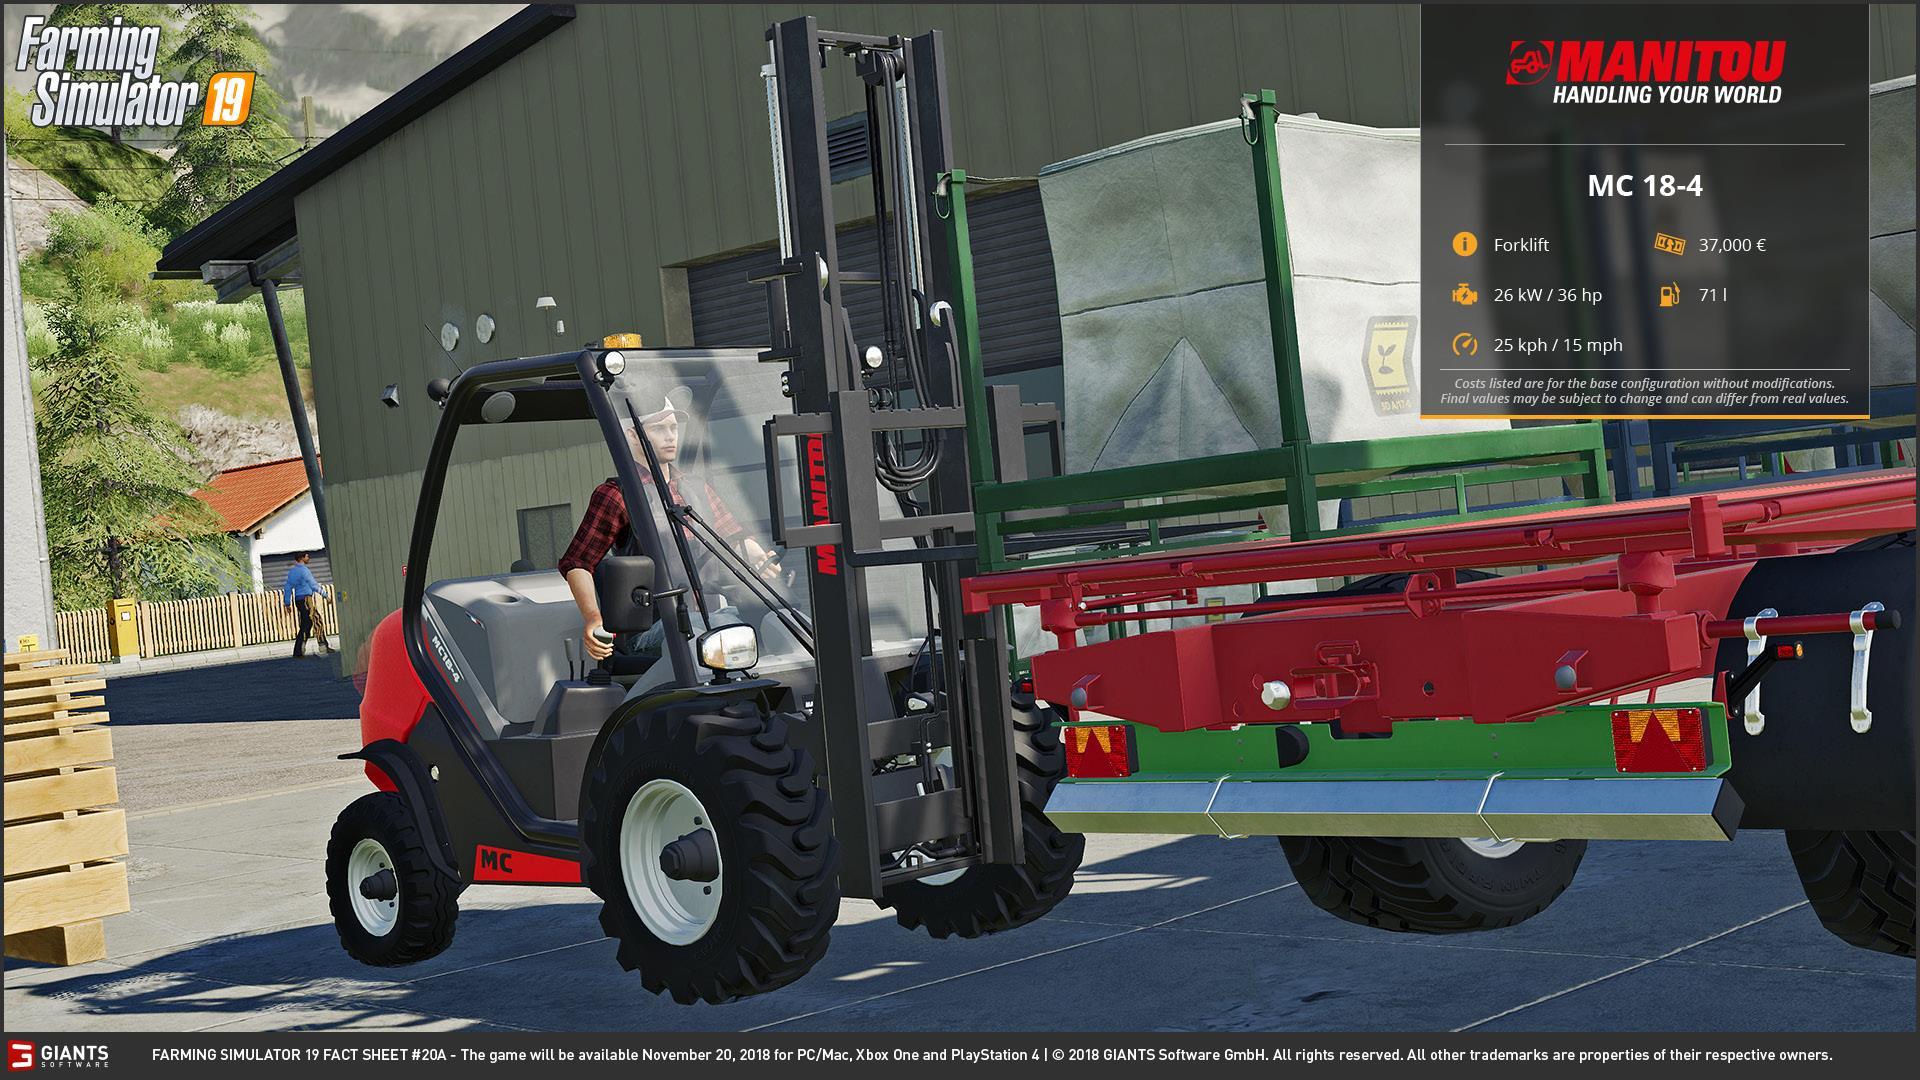 Farming Simulator 19 - JCB, Case, New Holland and More! - Farming